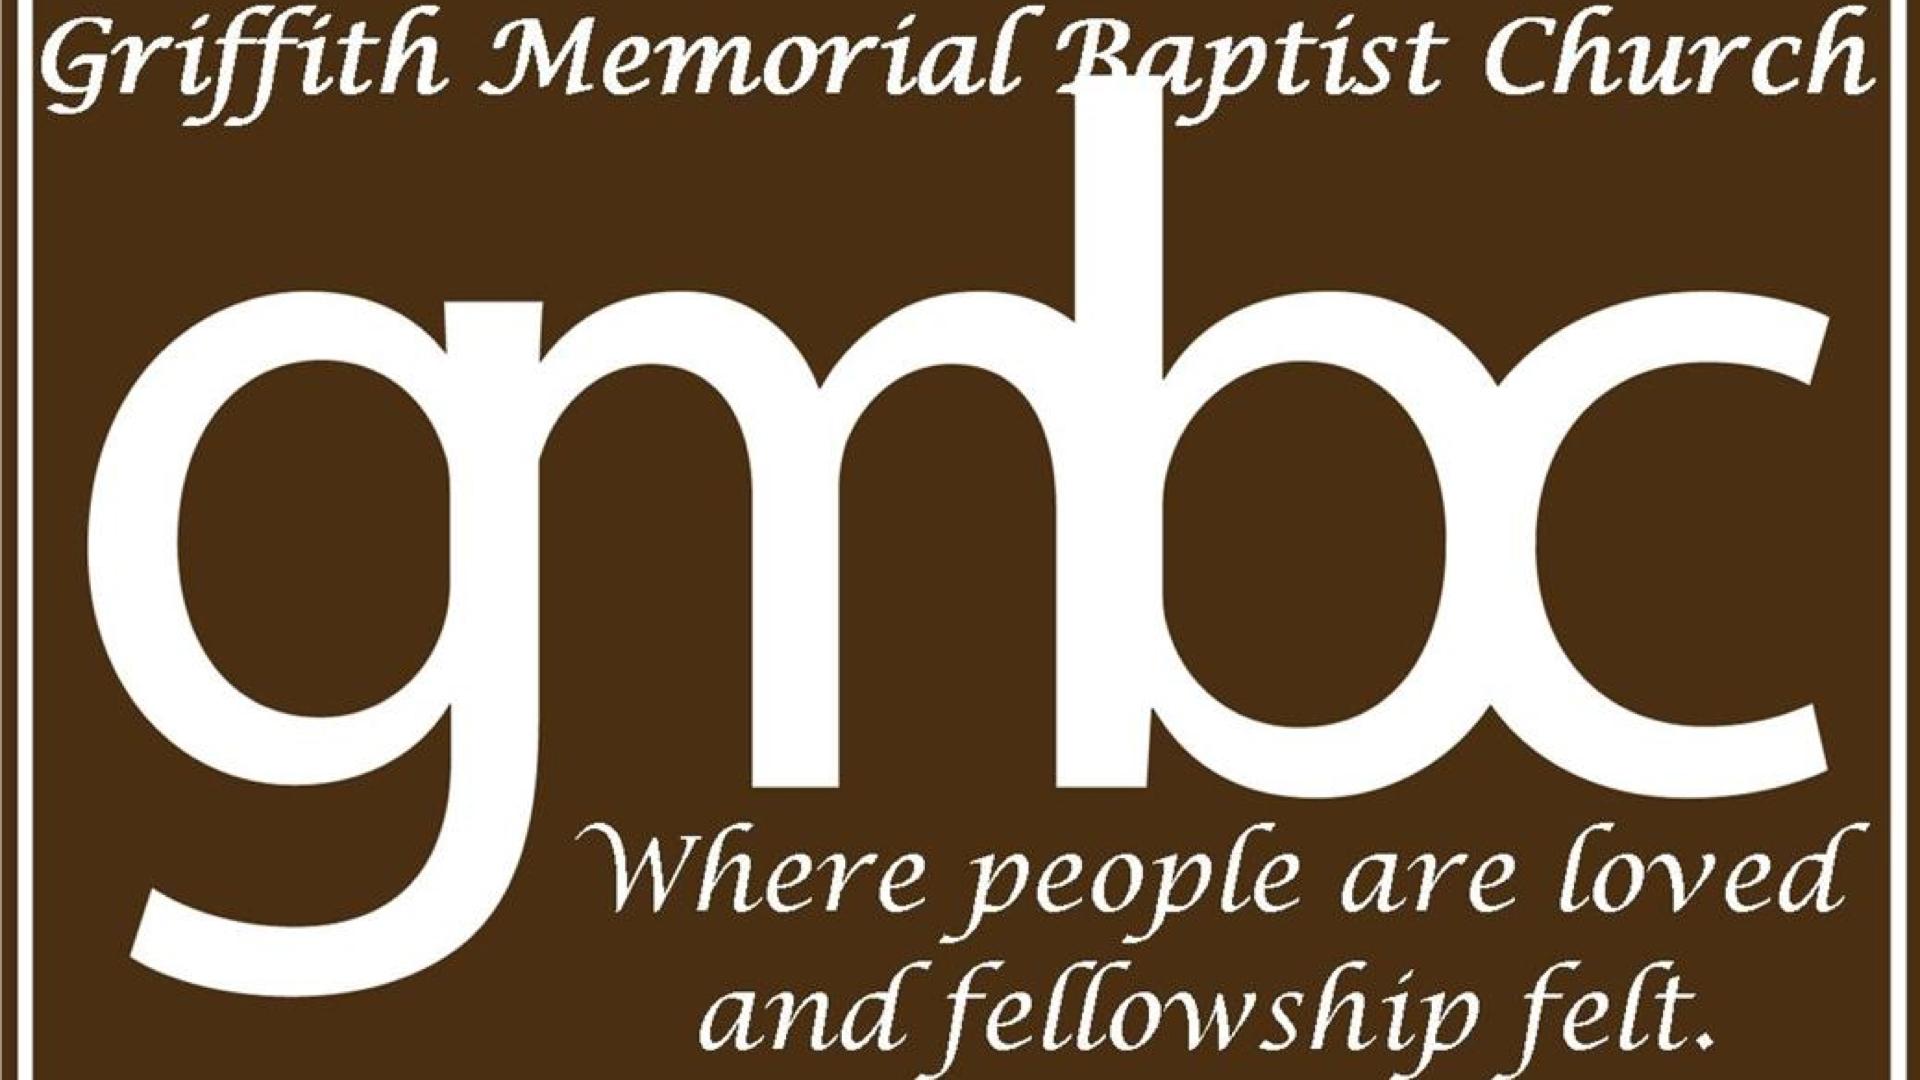 Griffith Memorial Baptist Church